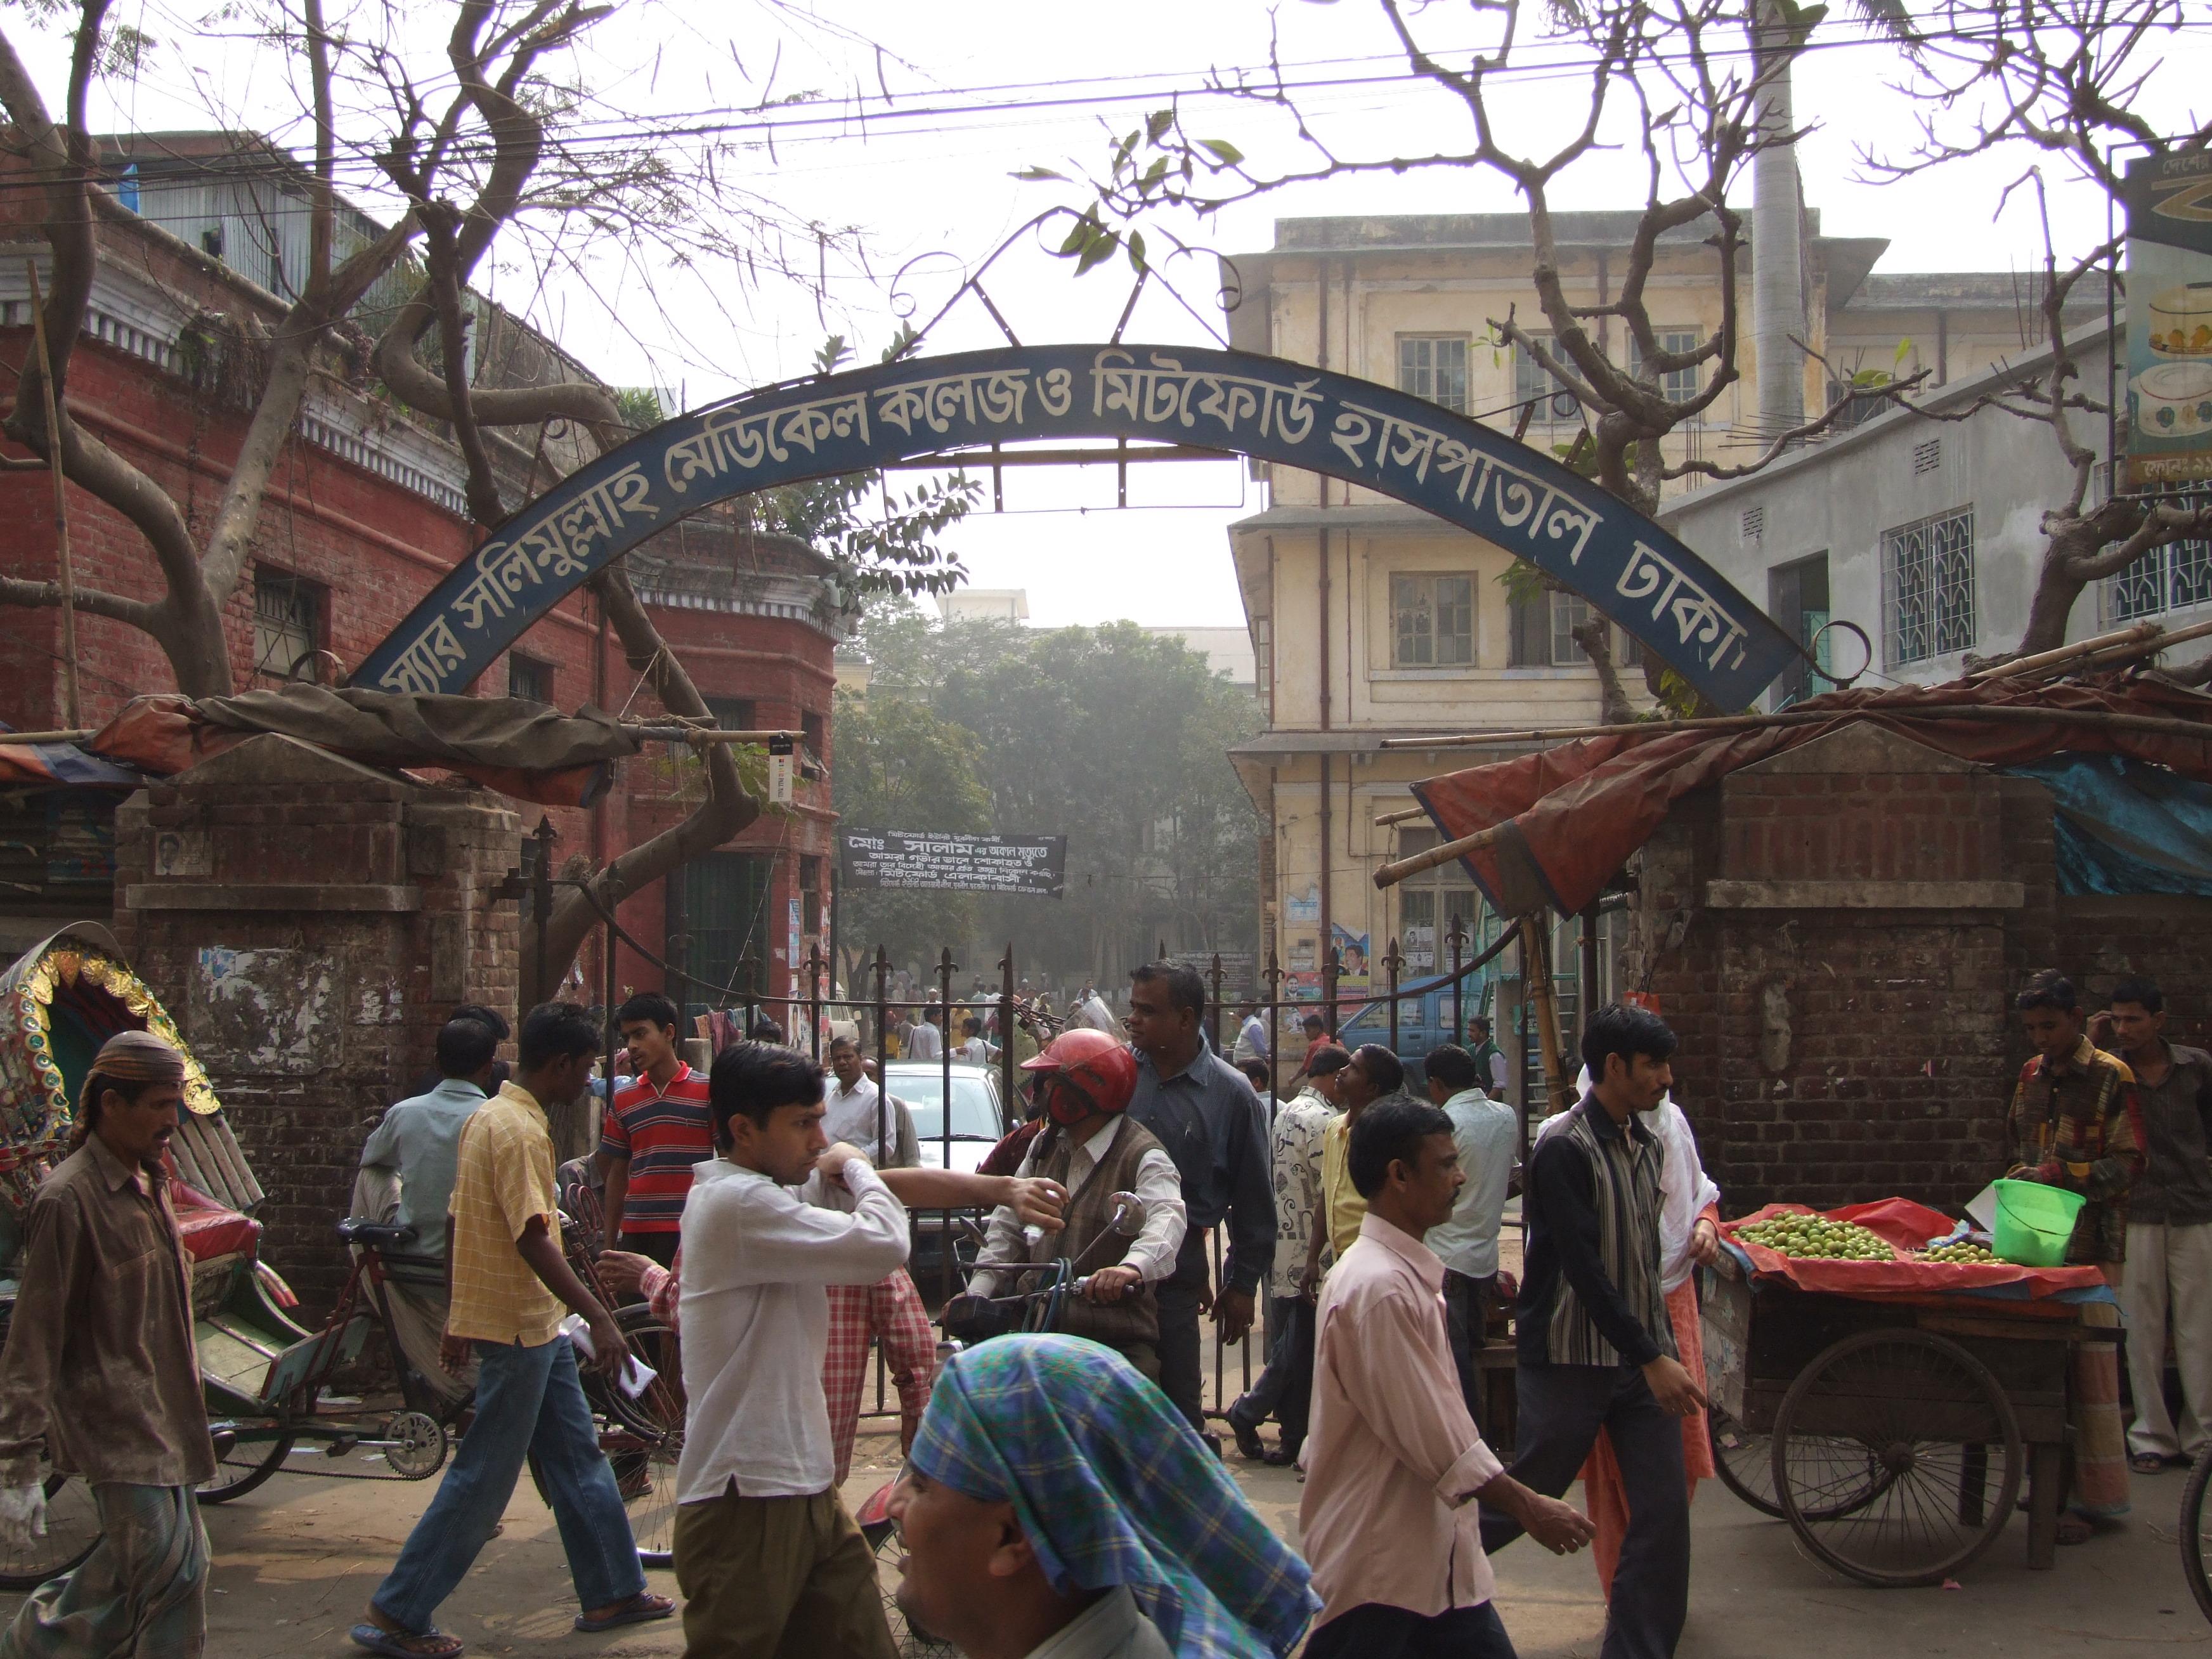 historic dhaka city past glory and Location: central bangladesh bibhag: dhaka (145 million - 9th largest city  population in the world) population: 85 million (dhaka city) famous people.